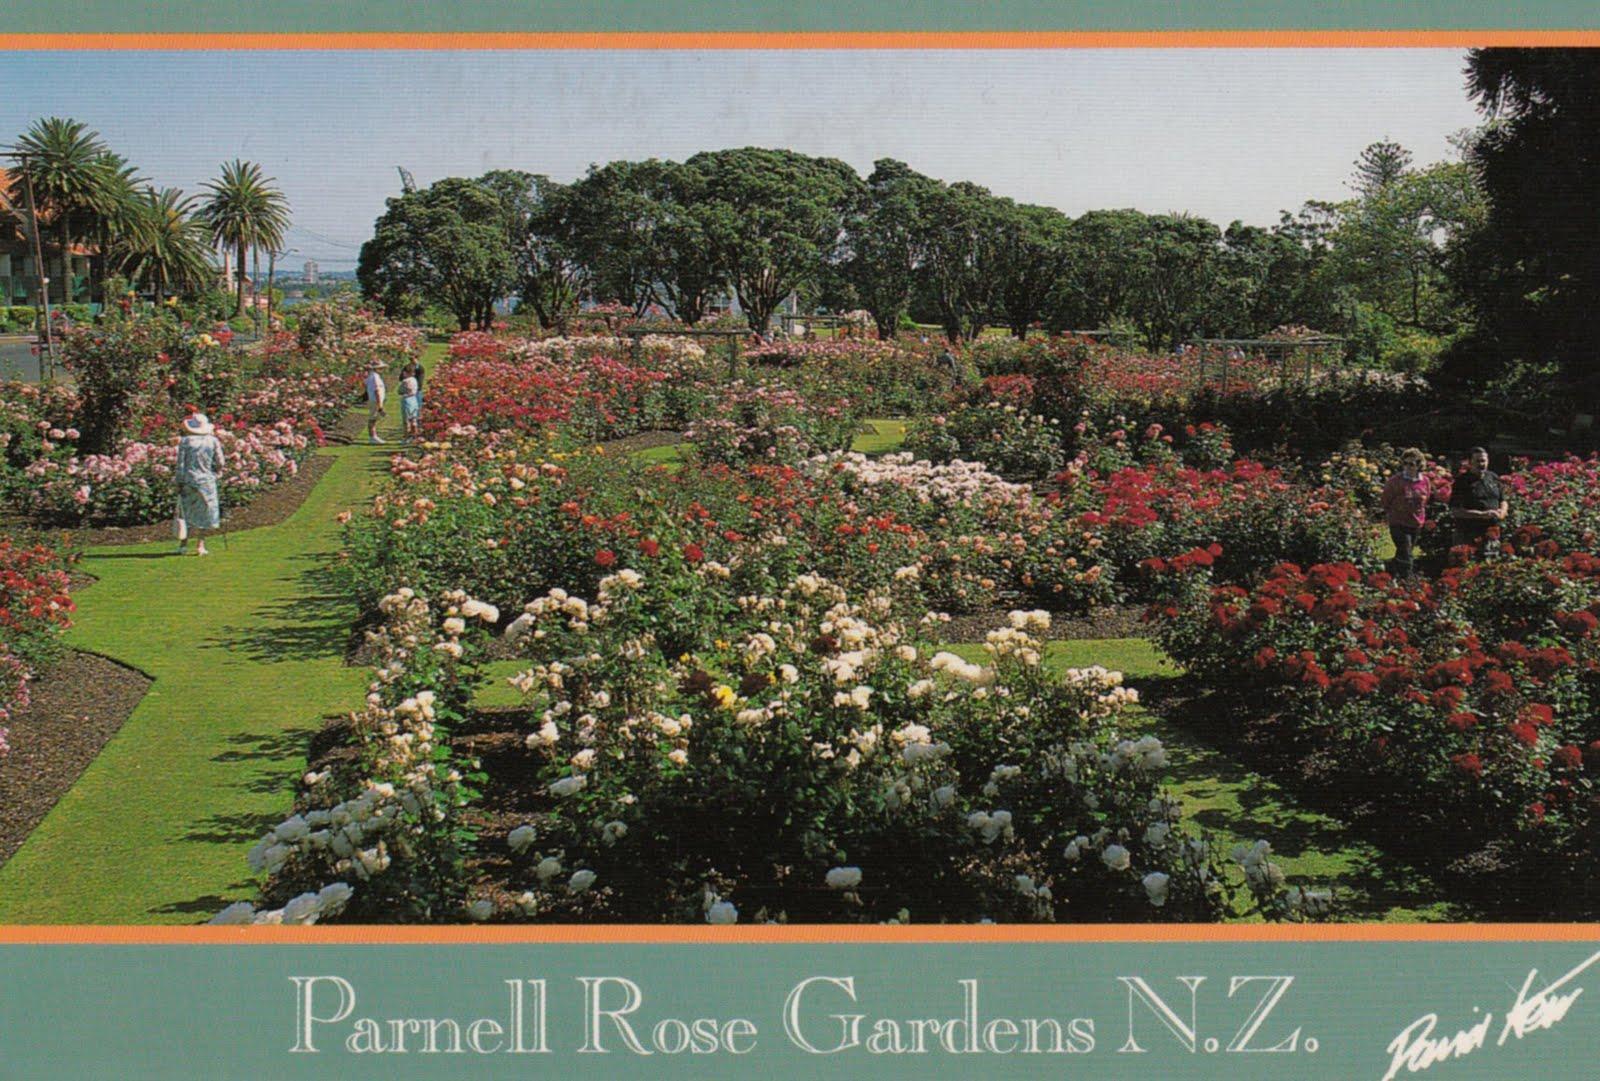 Amanda from Seattle: Wild Card: New Zealand Rose Gardens